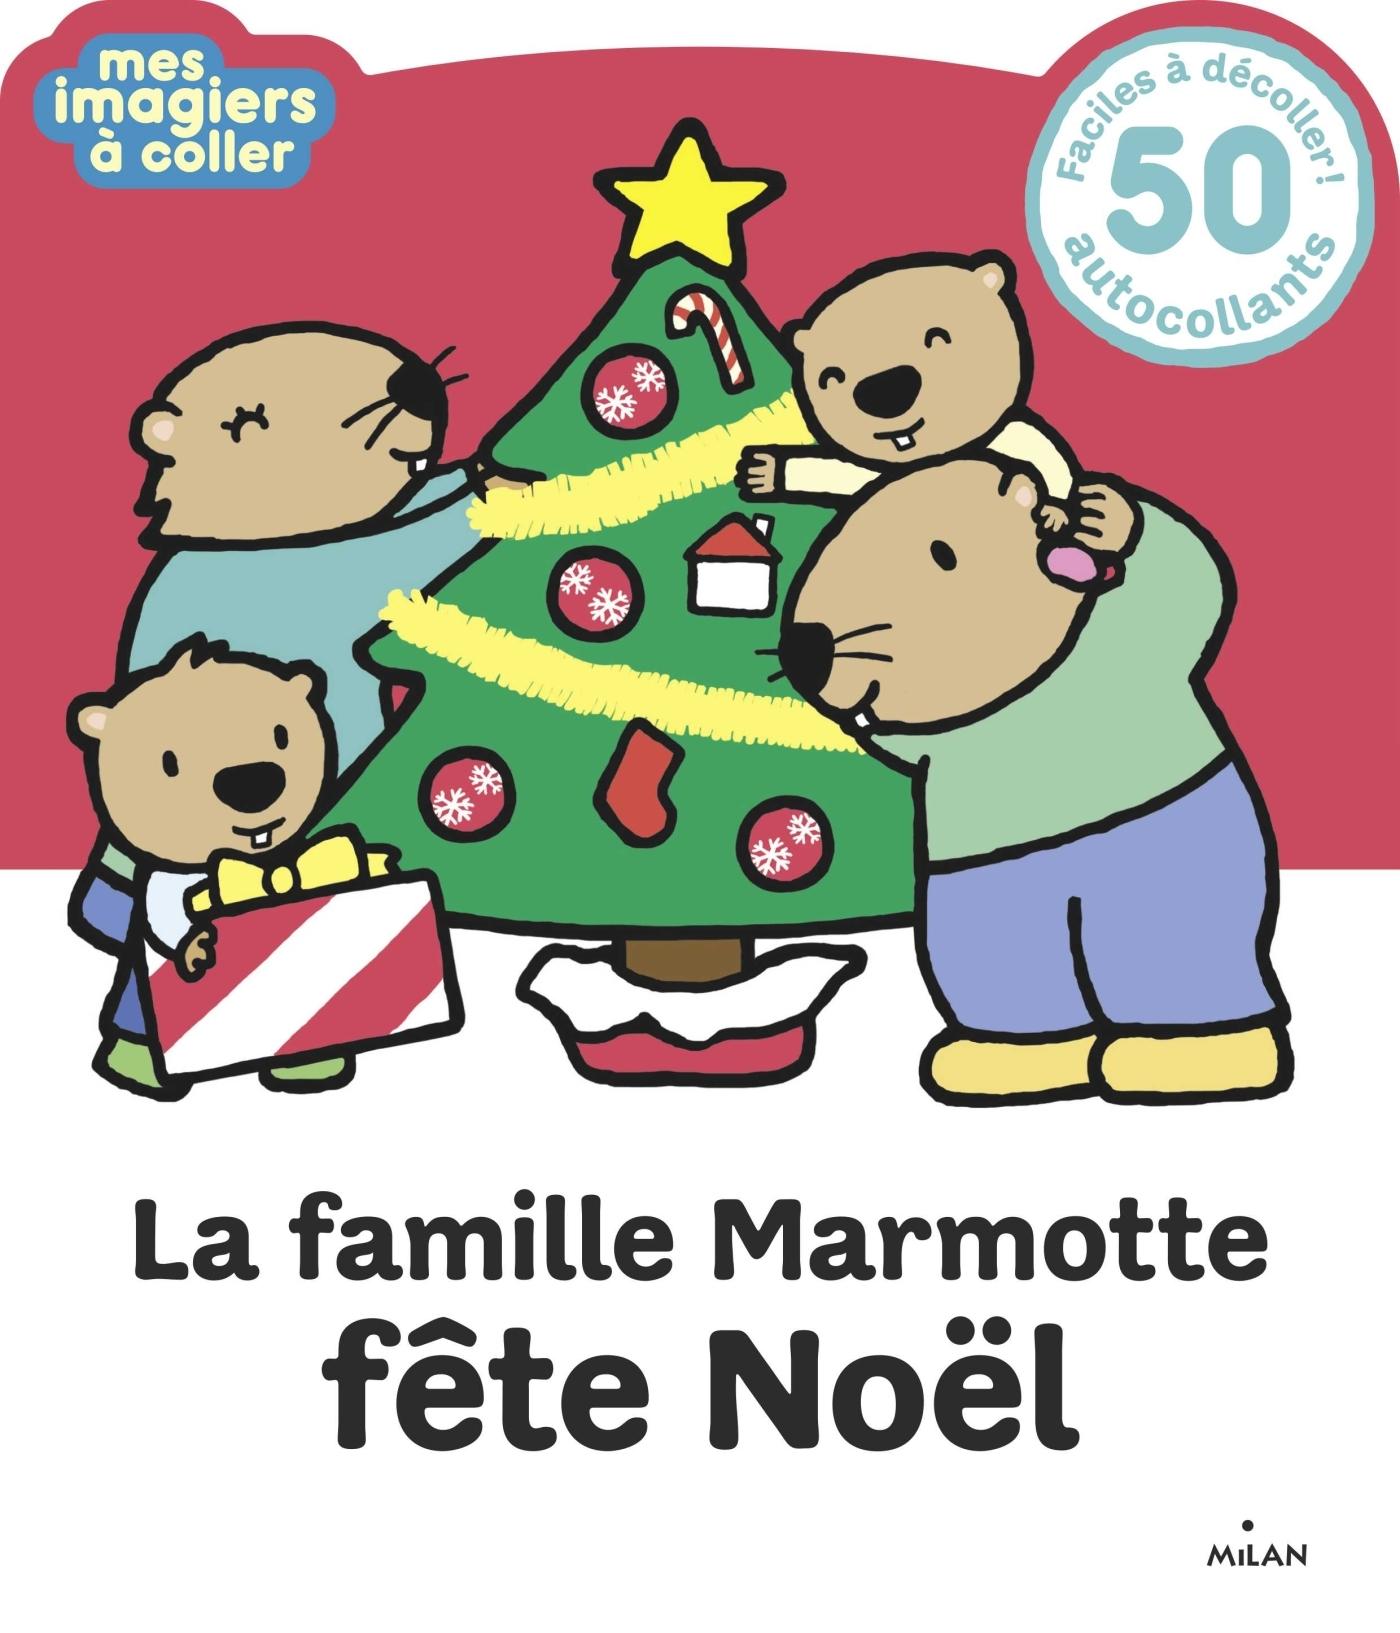 LA FAMILLE MARMOTTE FETE NOEL